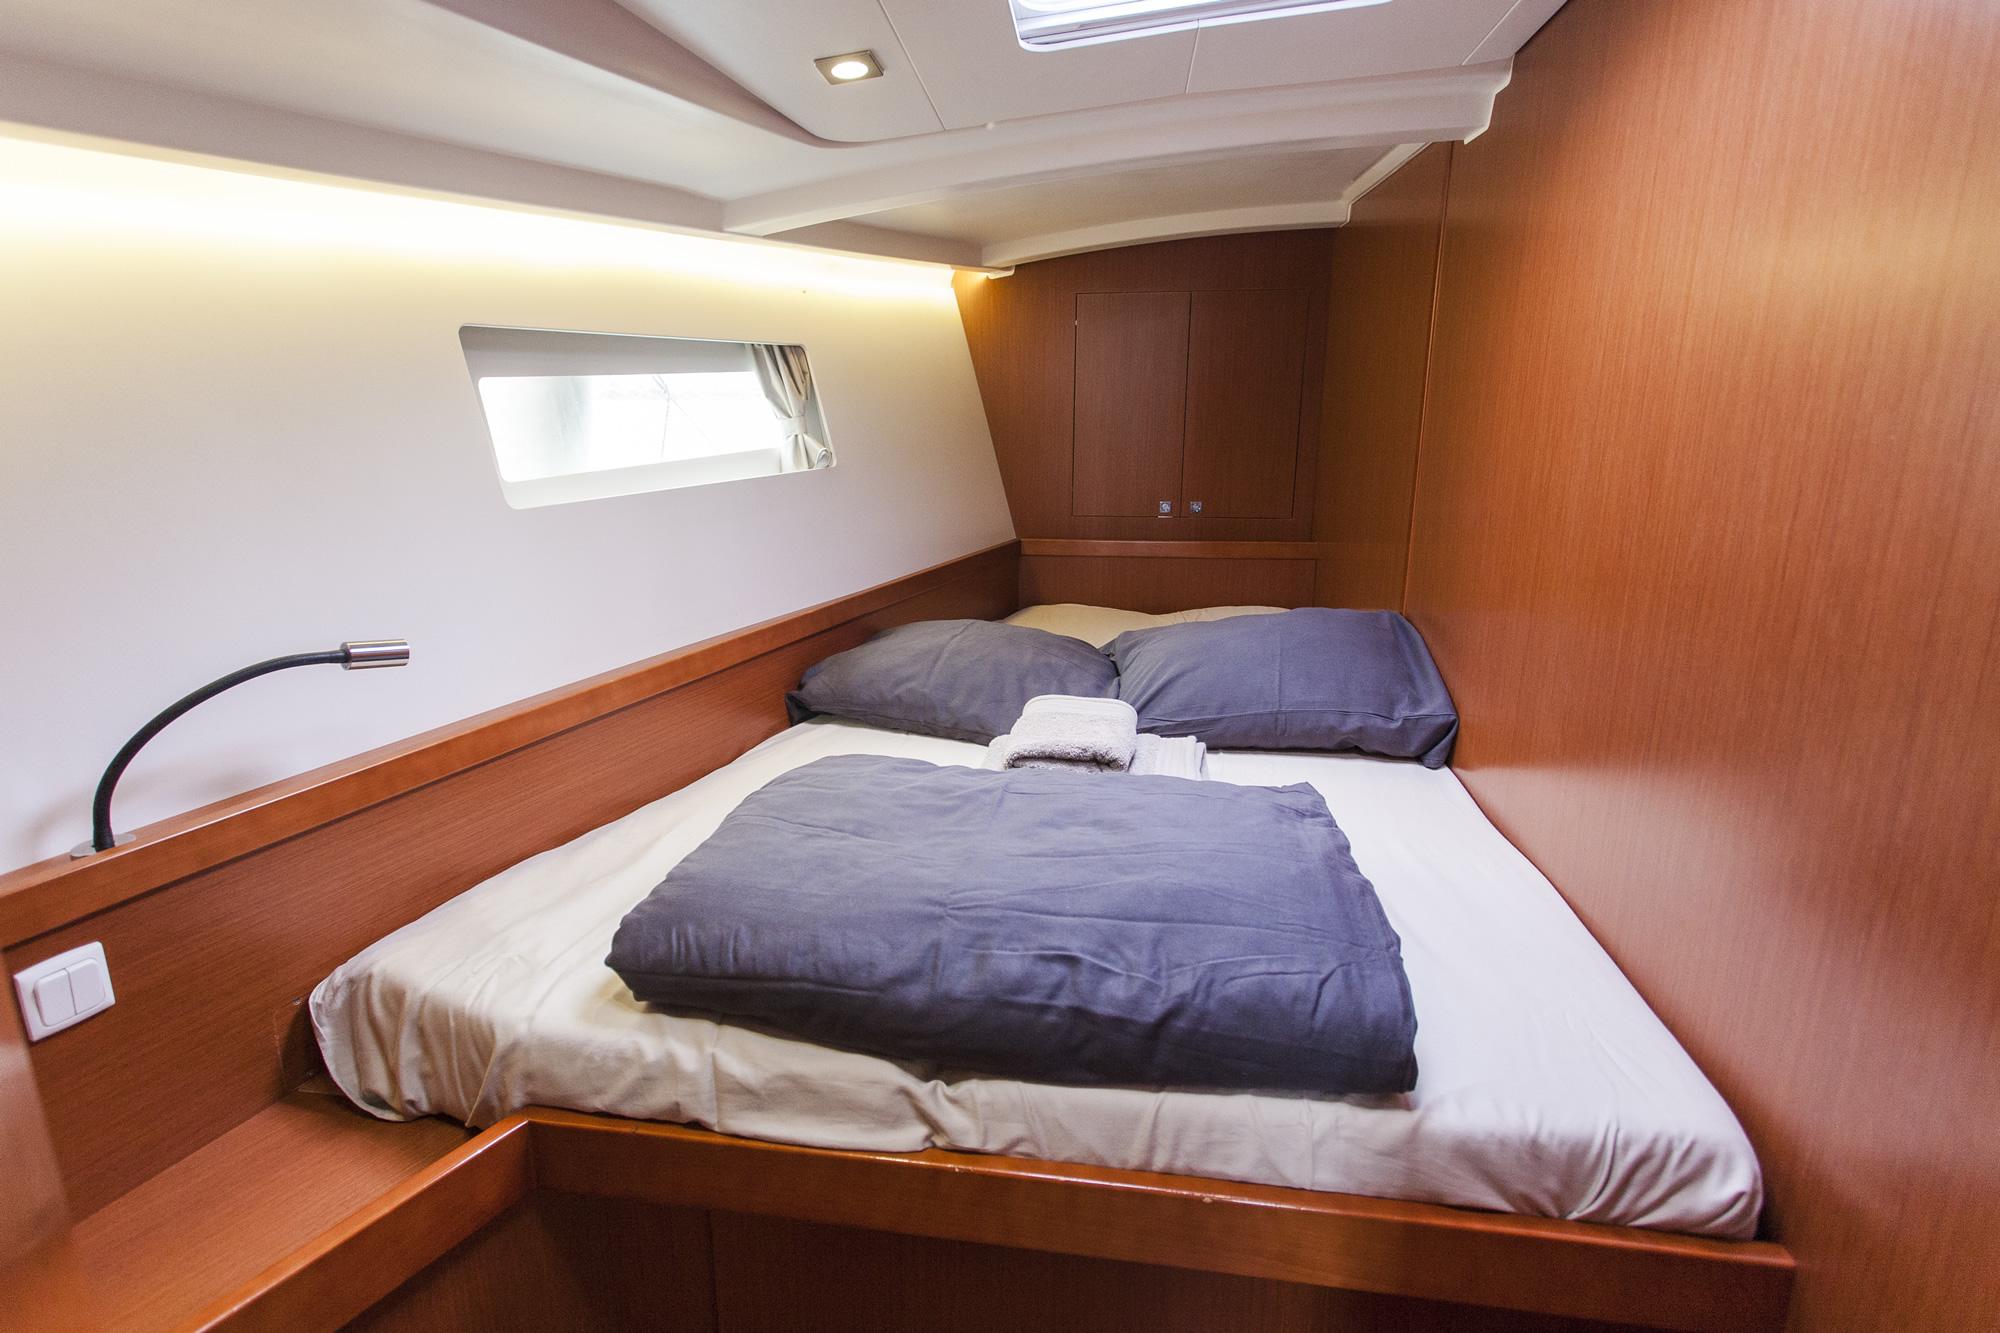 Oceanis 45 bedroom